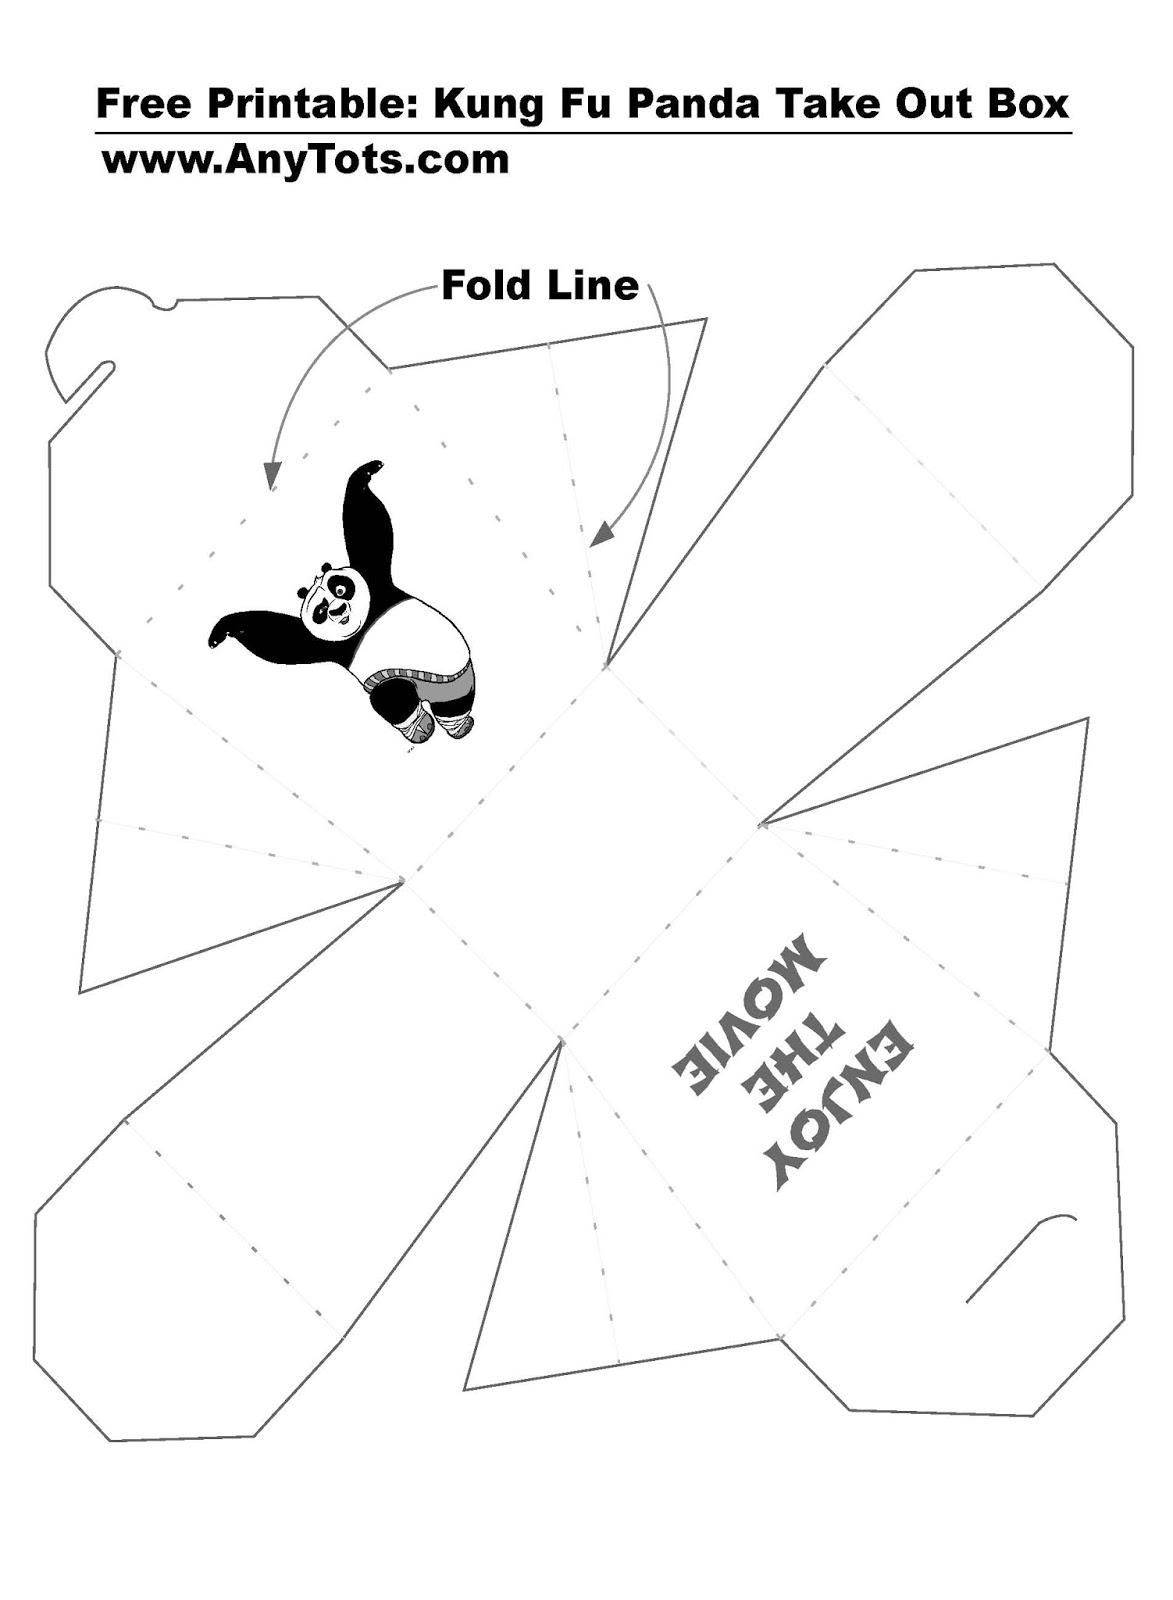 Kung Fu Panda Party Ideas Free Printable Chinese Take Out